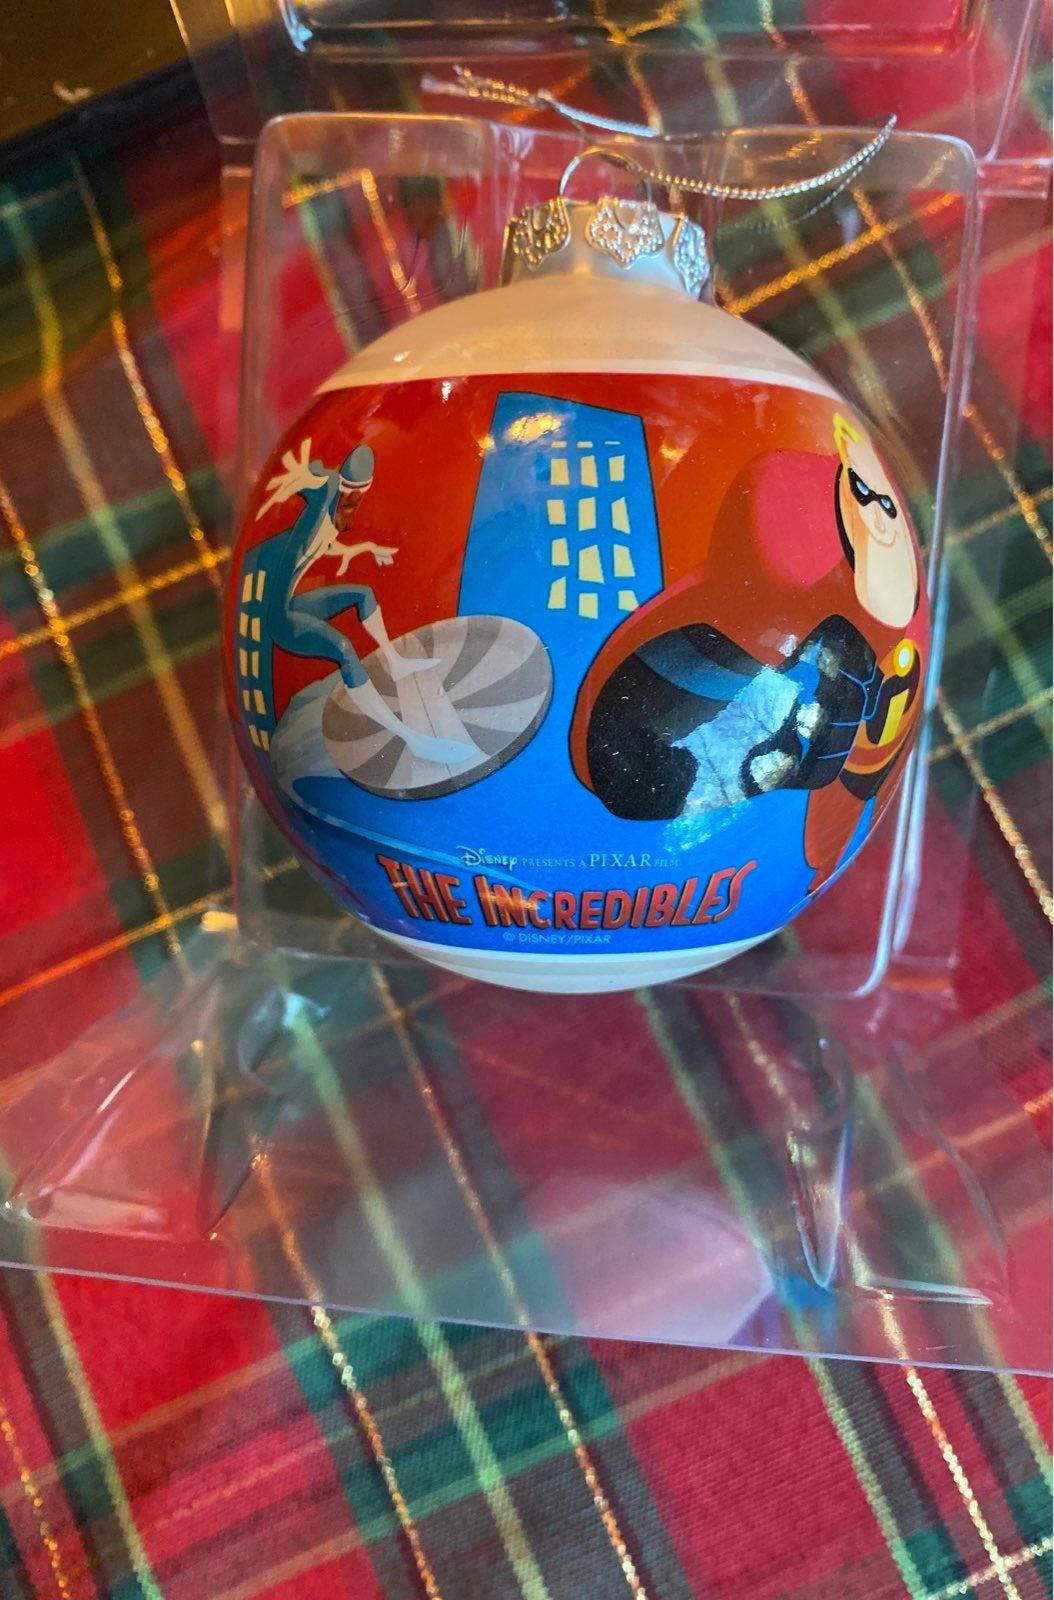 Disney Pixar The Incredibles ornament